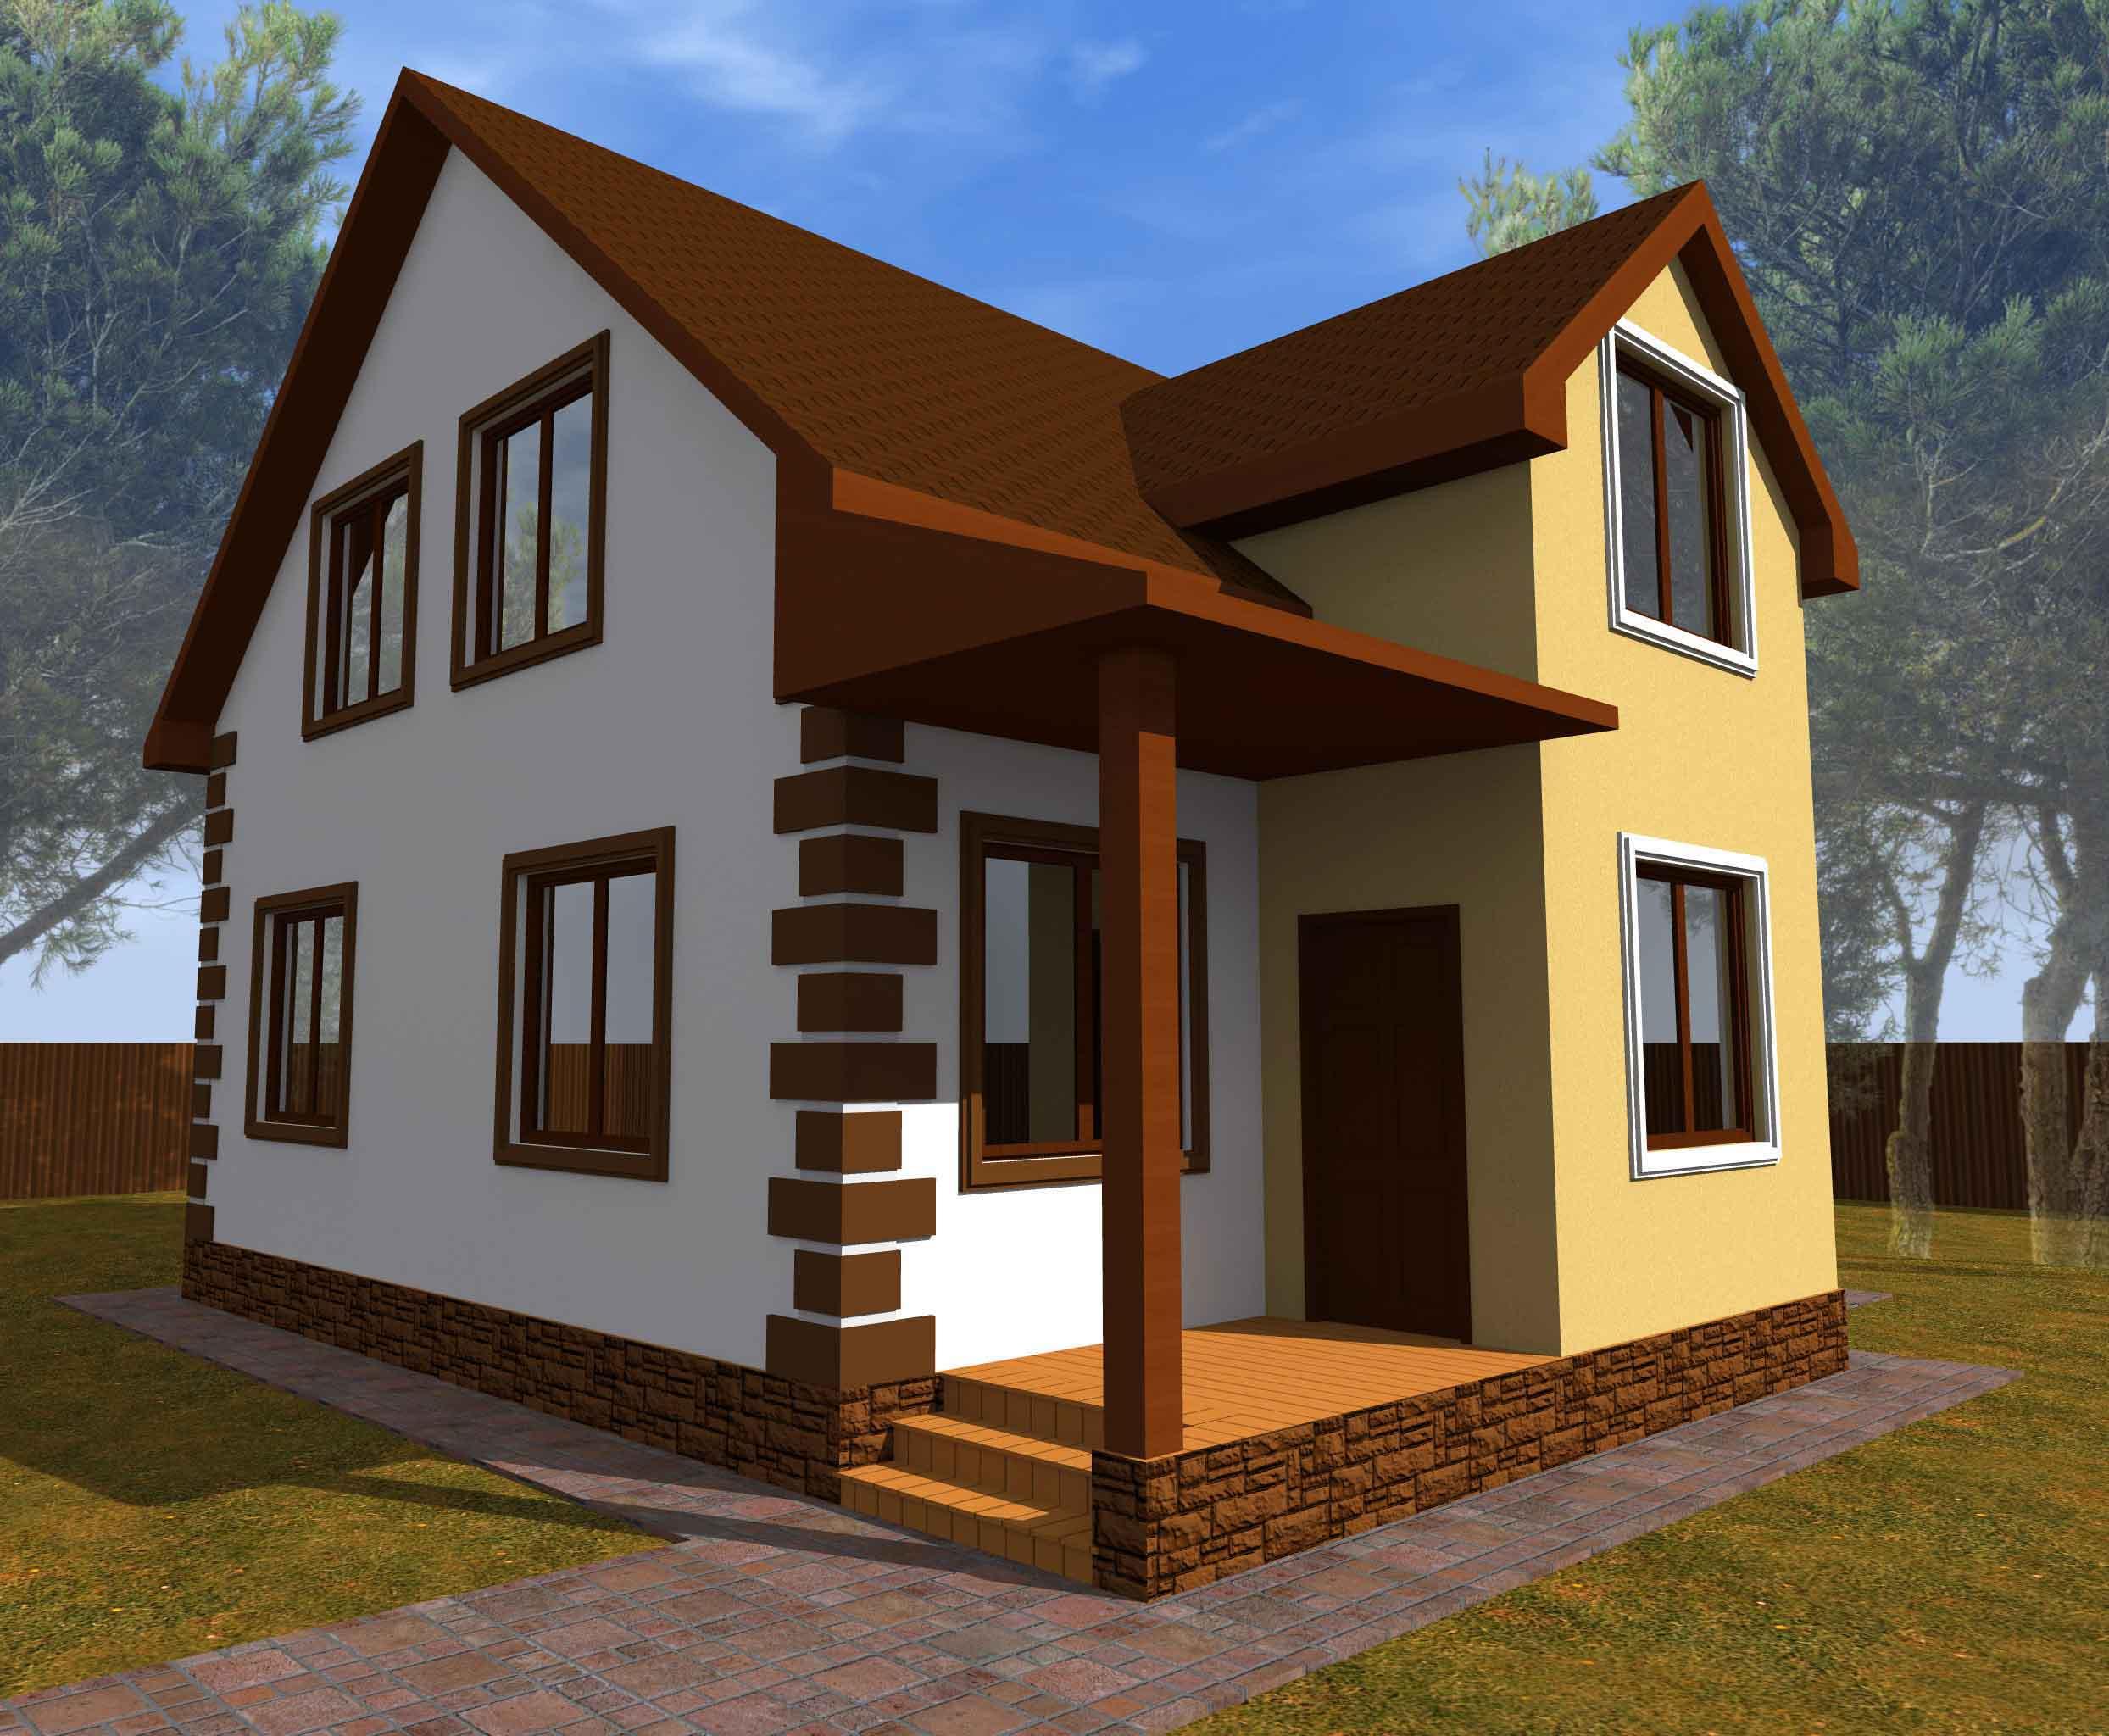 Проект каркасного дома 163 квадратных метра